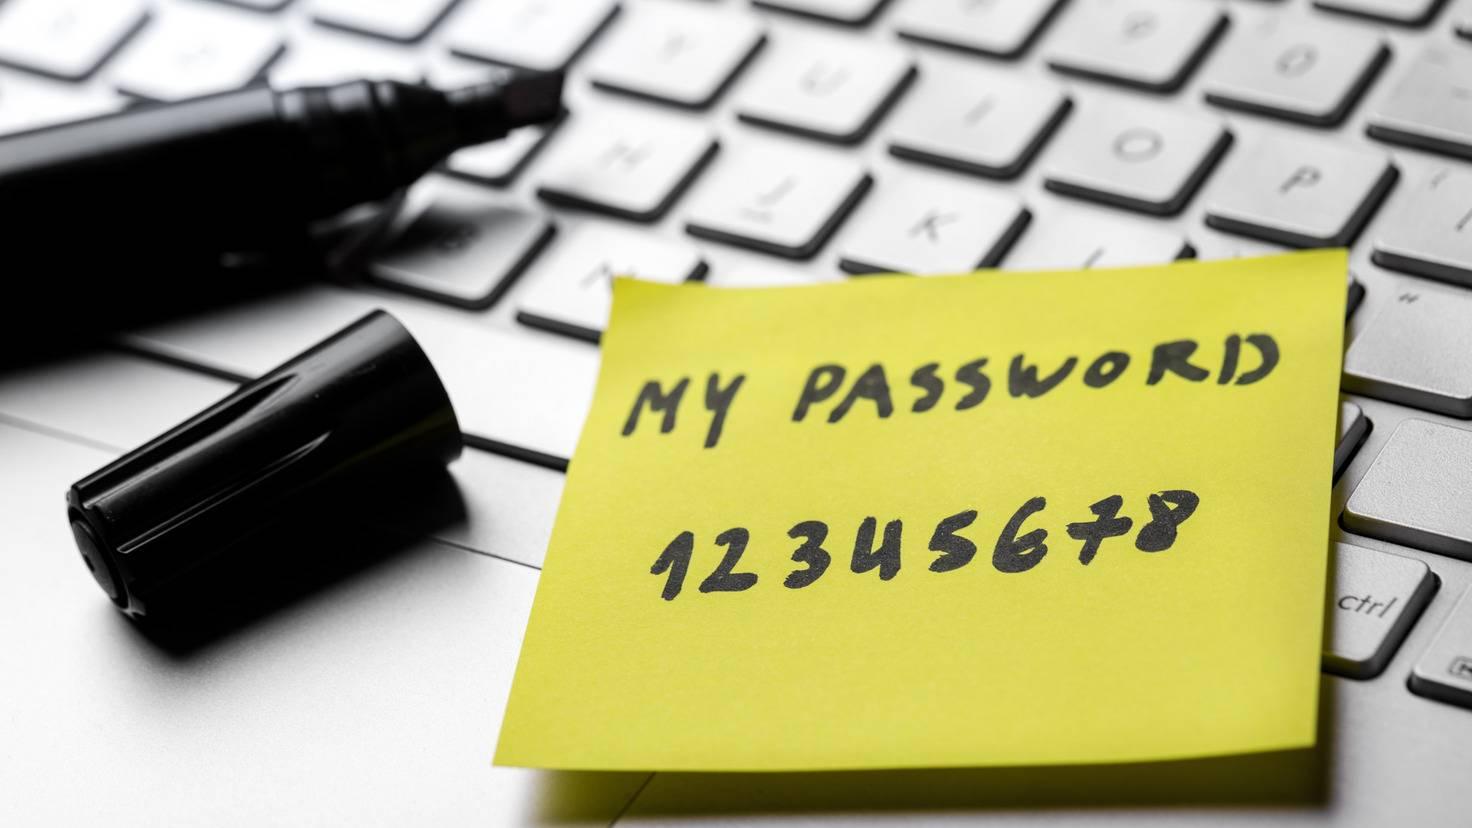 mot de passe-mots de passe-mot de passe